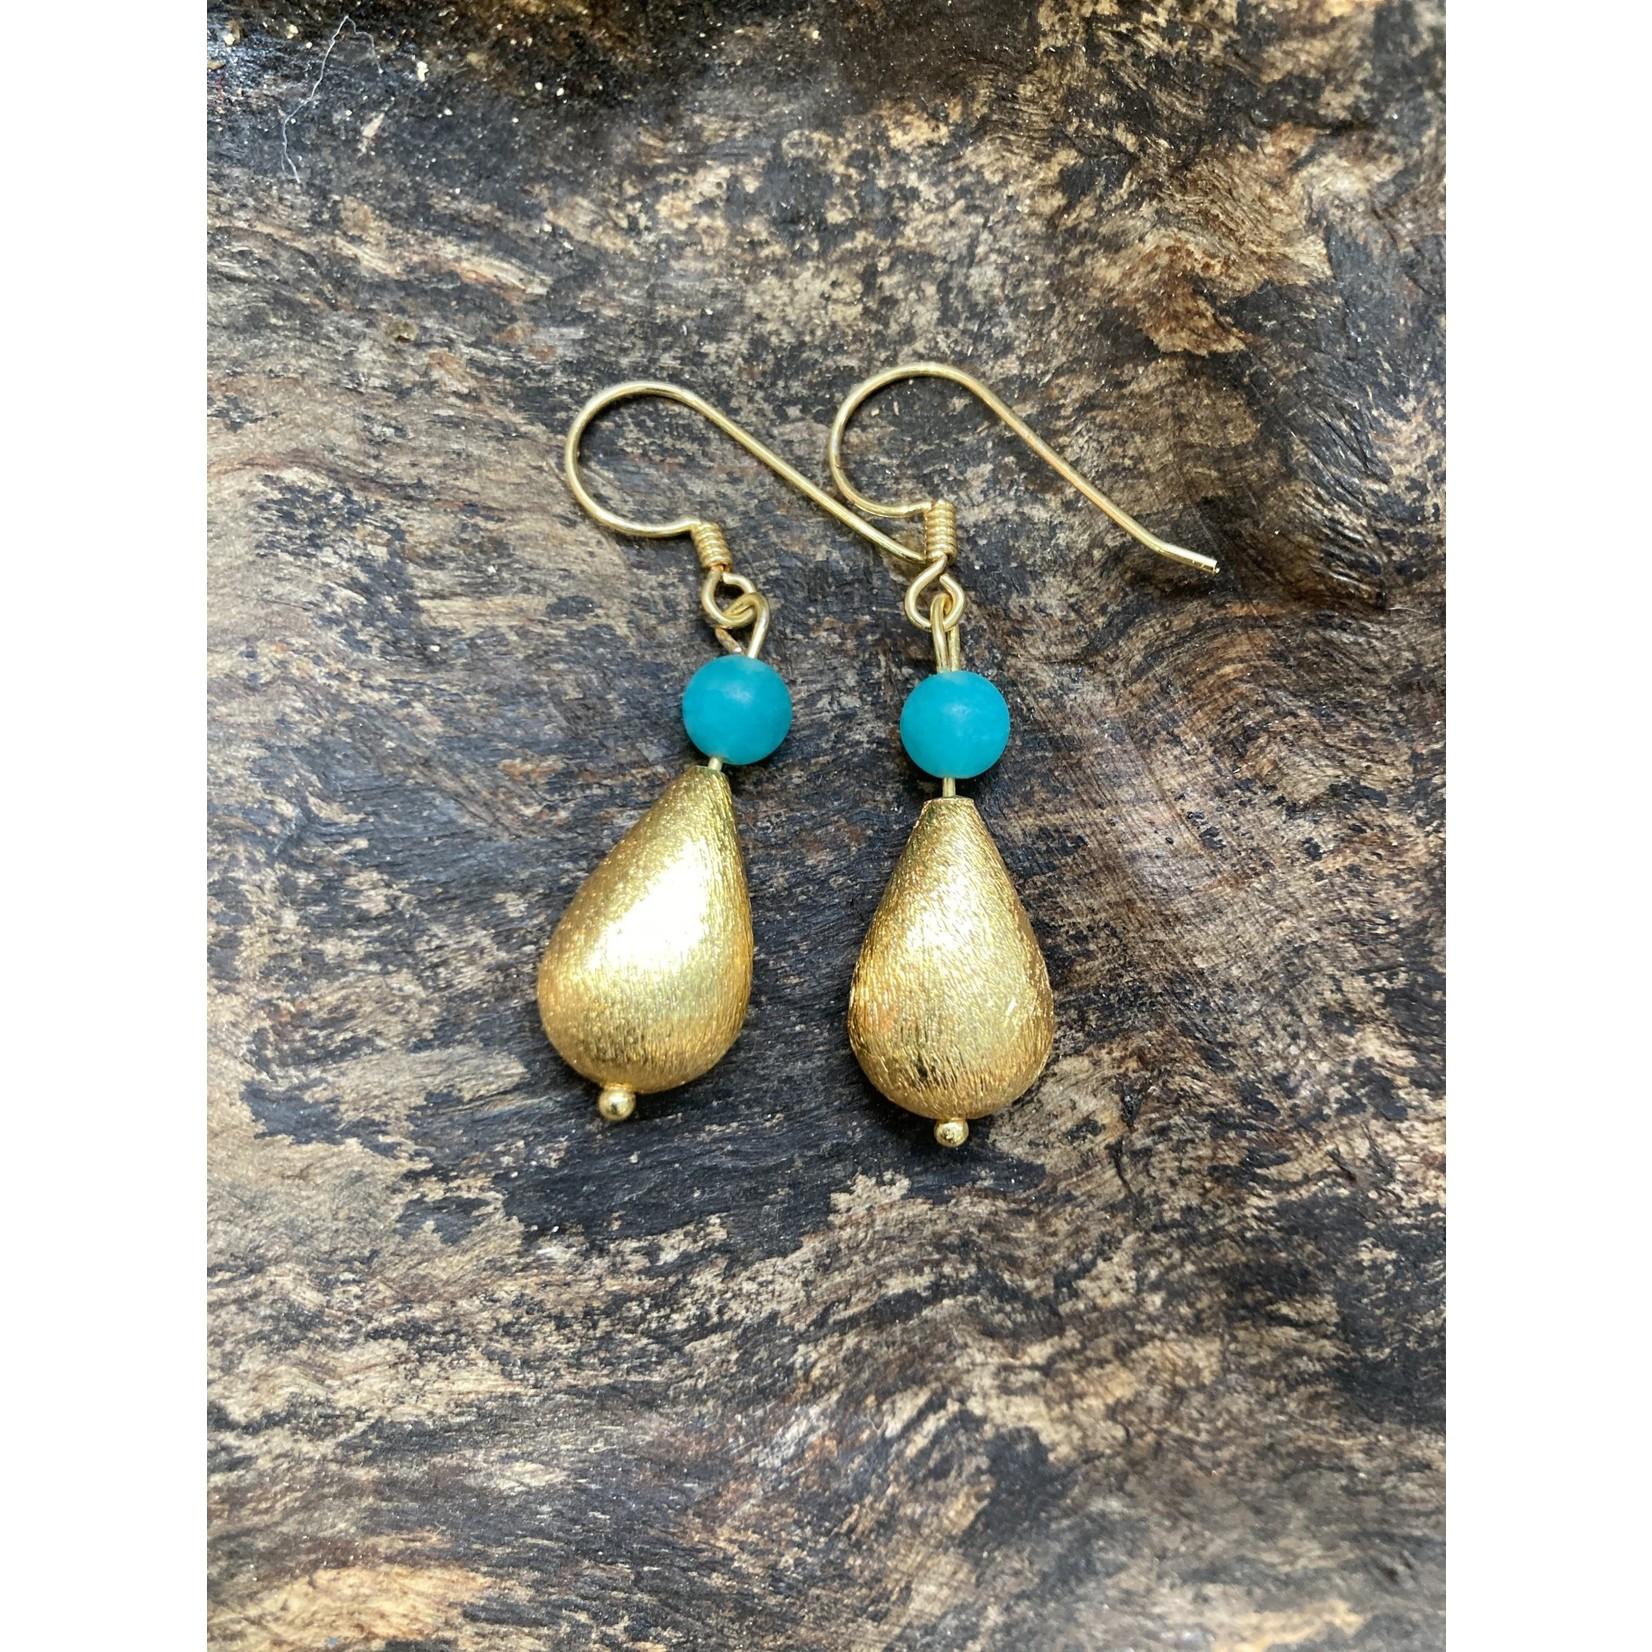 Charlene Campbell Charlene Campbell   Tear drop turquoise/jade earrings